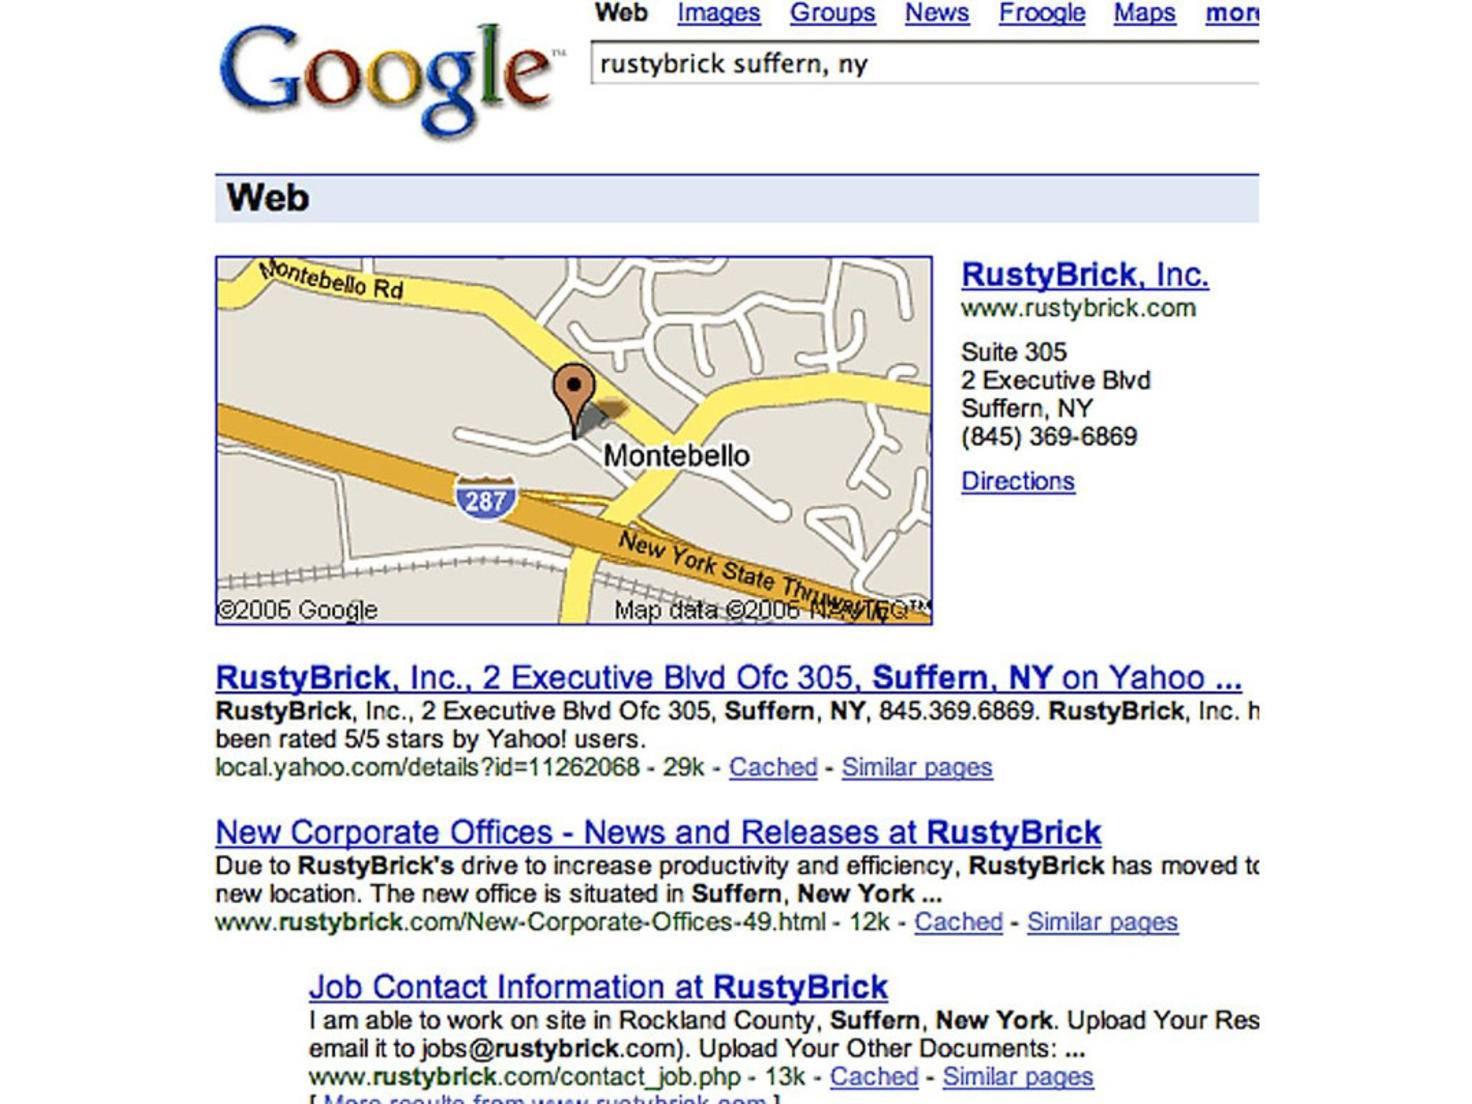 Google 2006